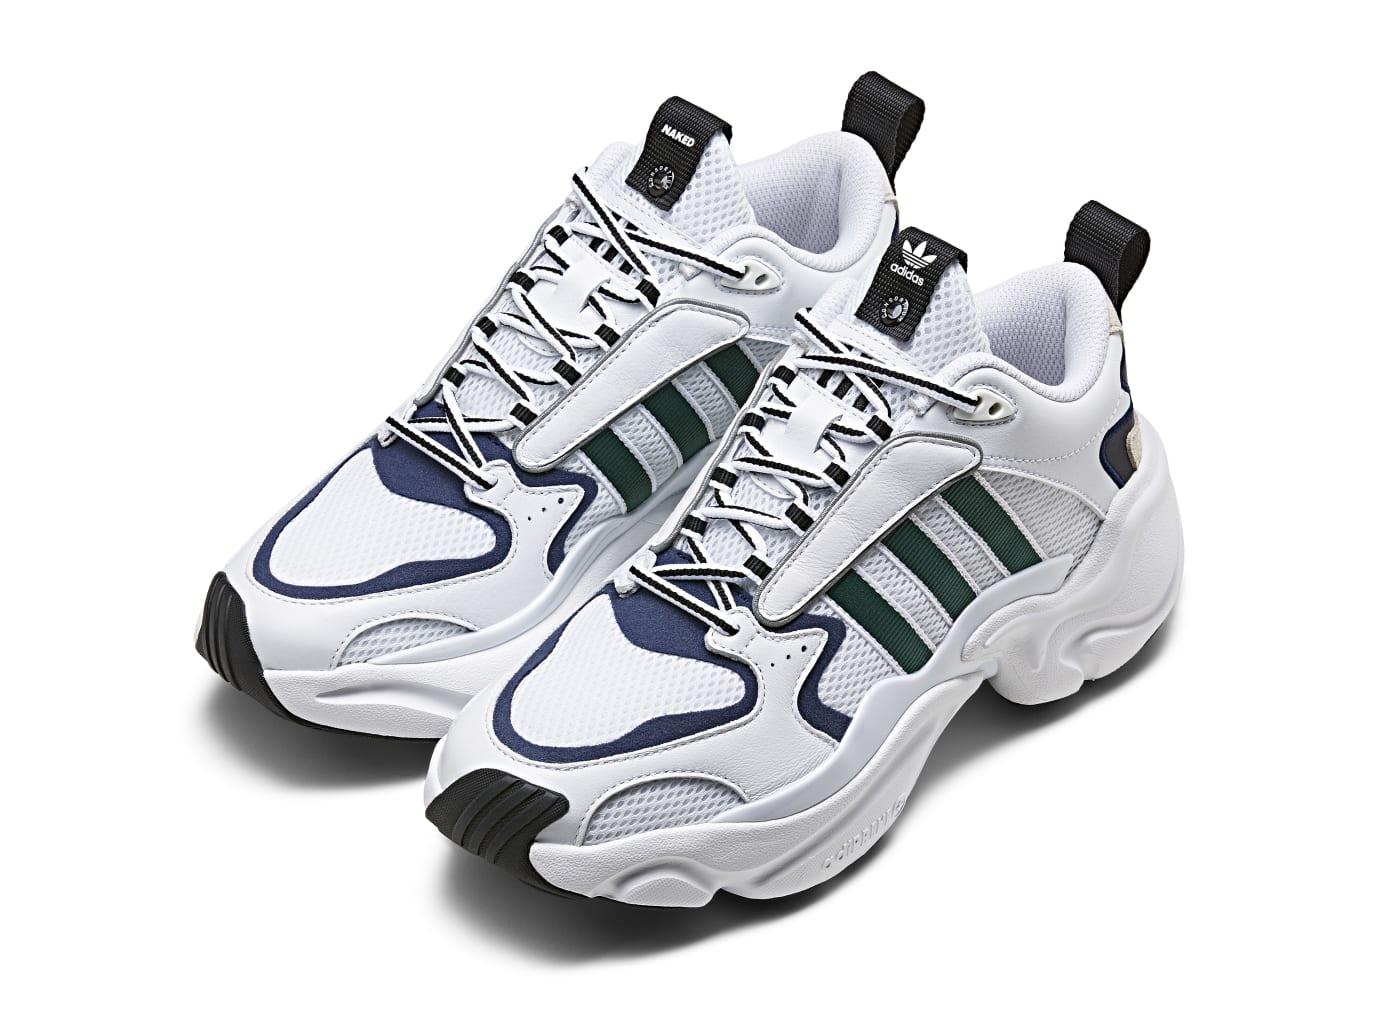 Adidas Consortium Communitas Naked Magmur Runner G26279 (Pair)